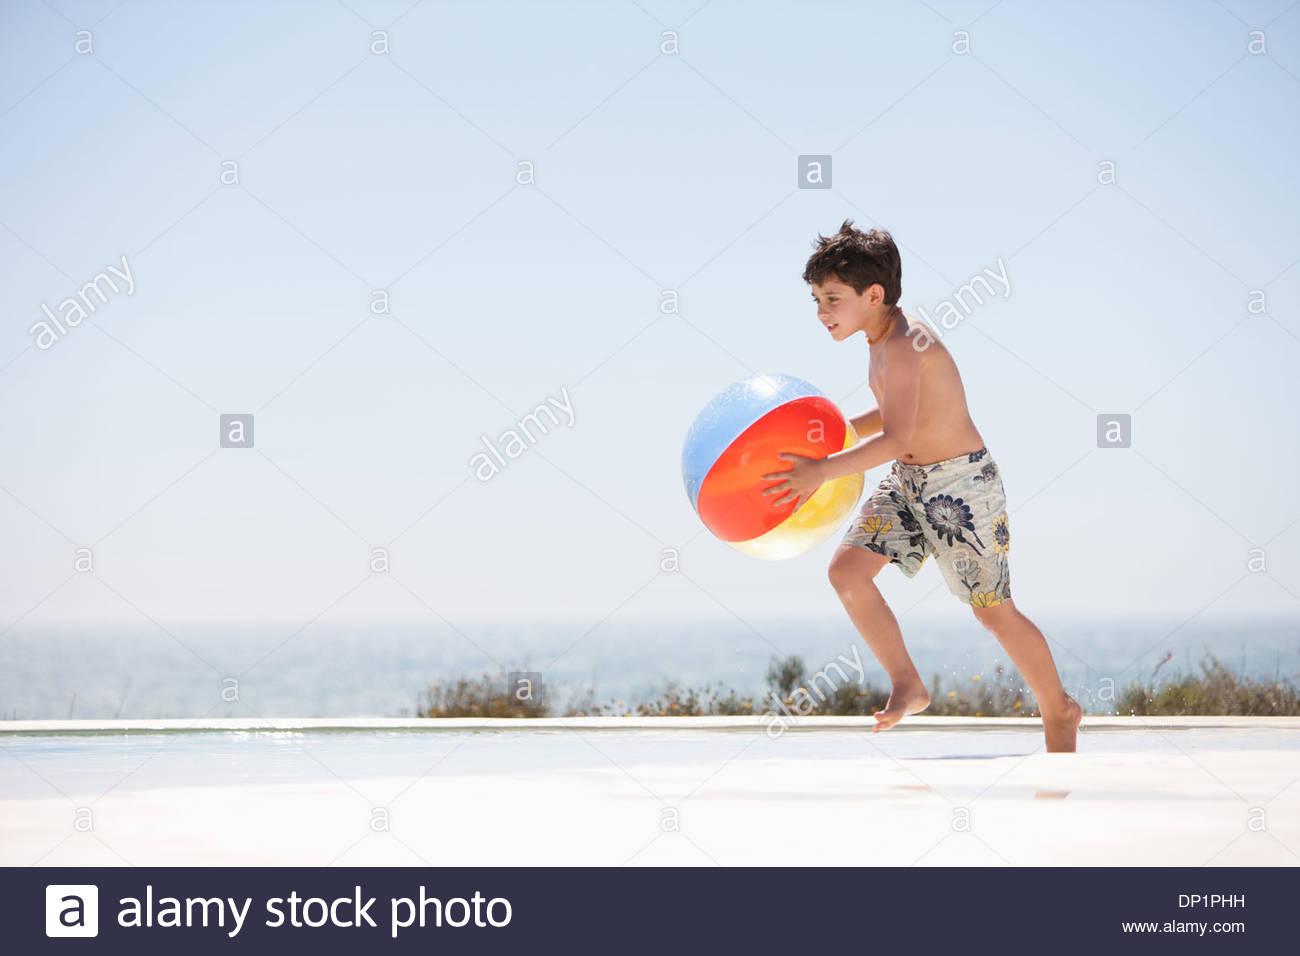 Boy holding beach ball beside pool - Stock Image